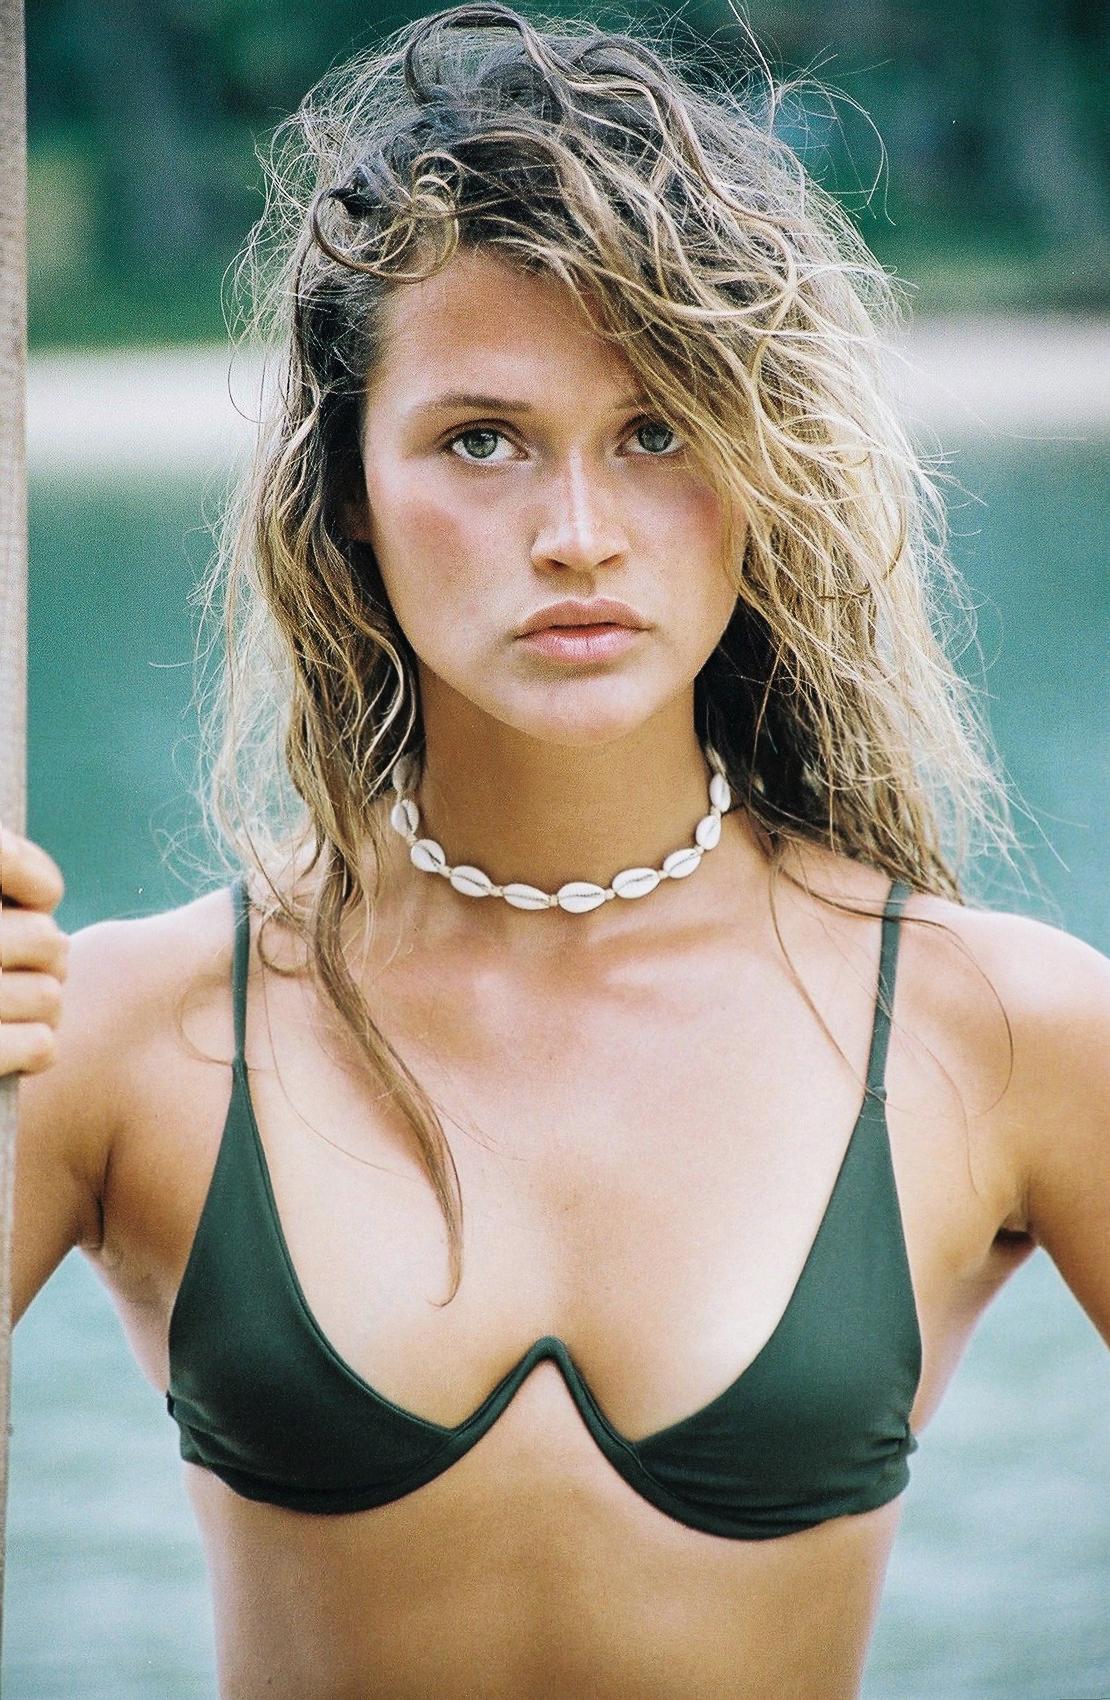 Chloe Lecareux for Bamba Swim